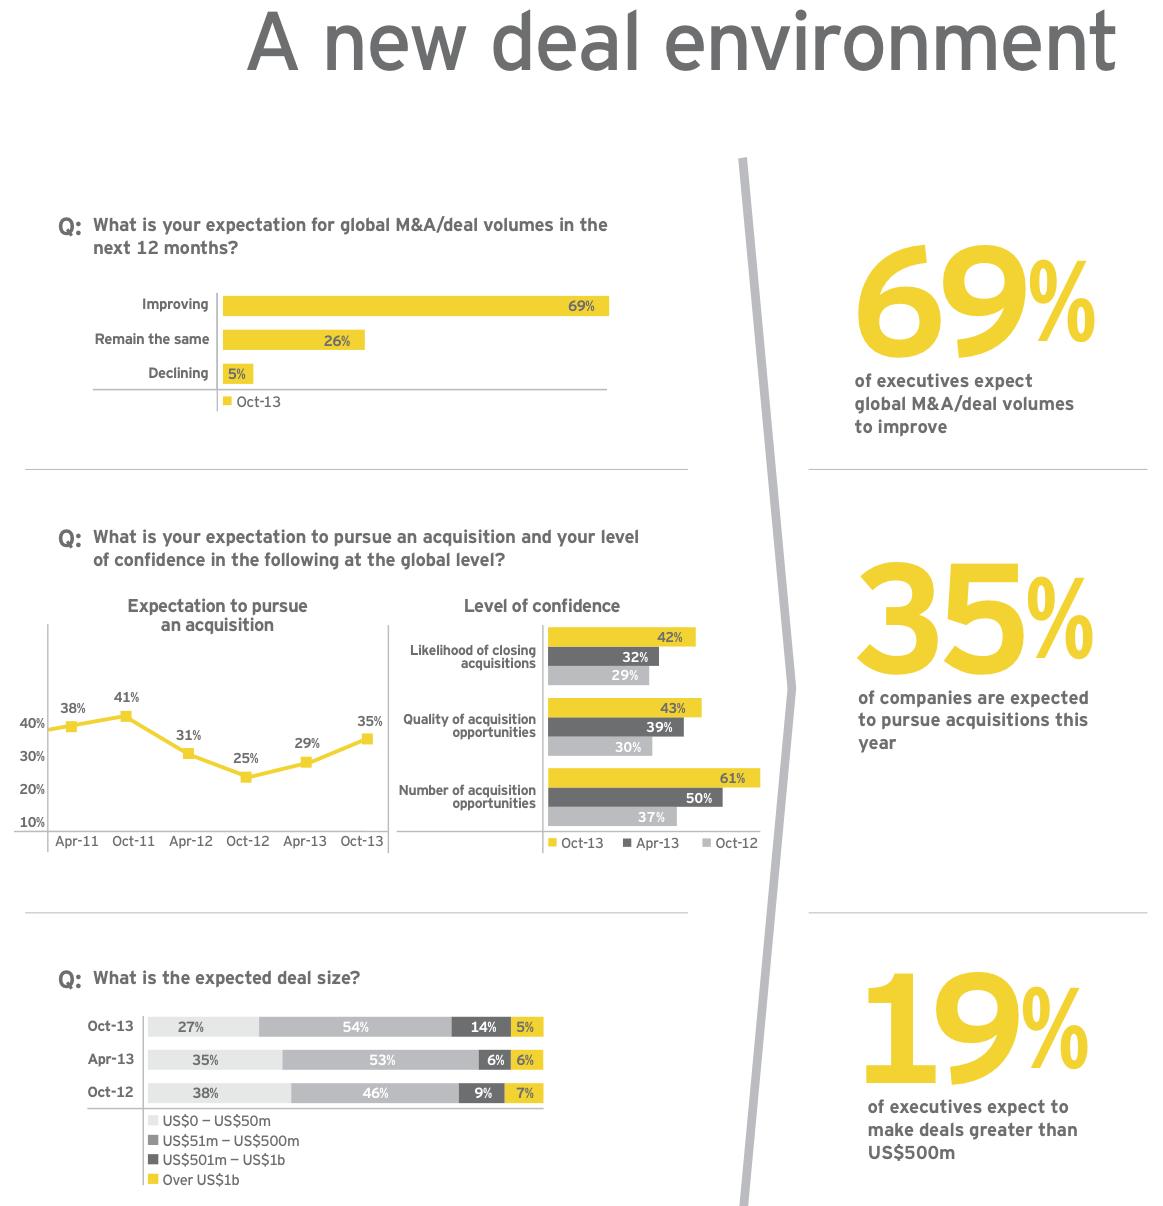 Figure 6: A new deal environment